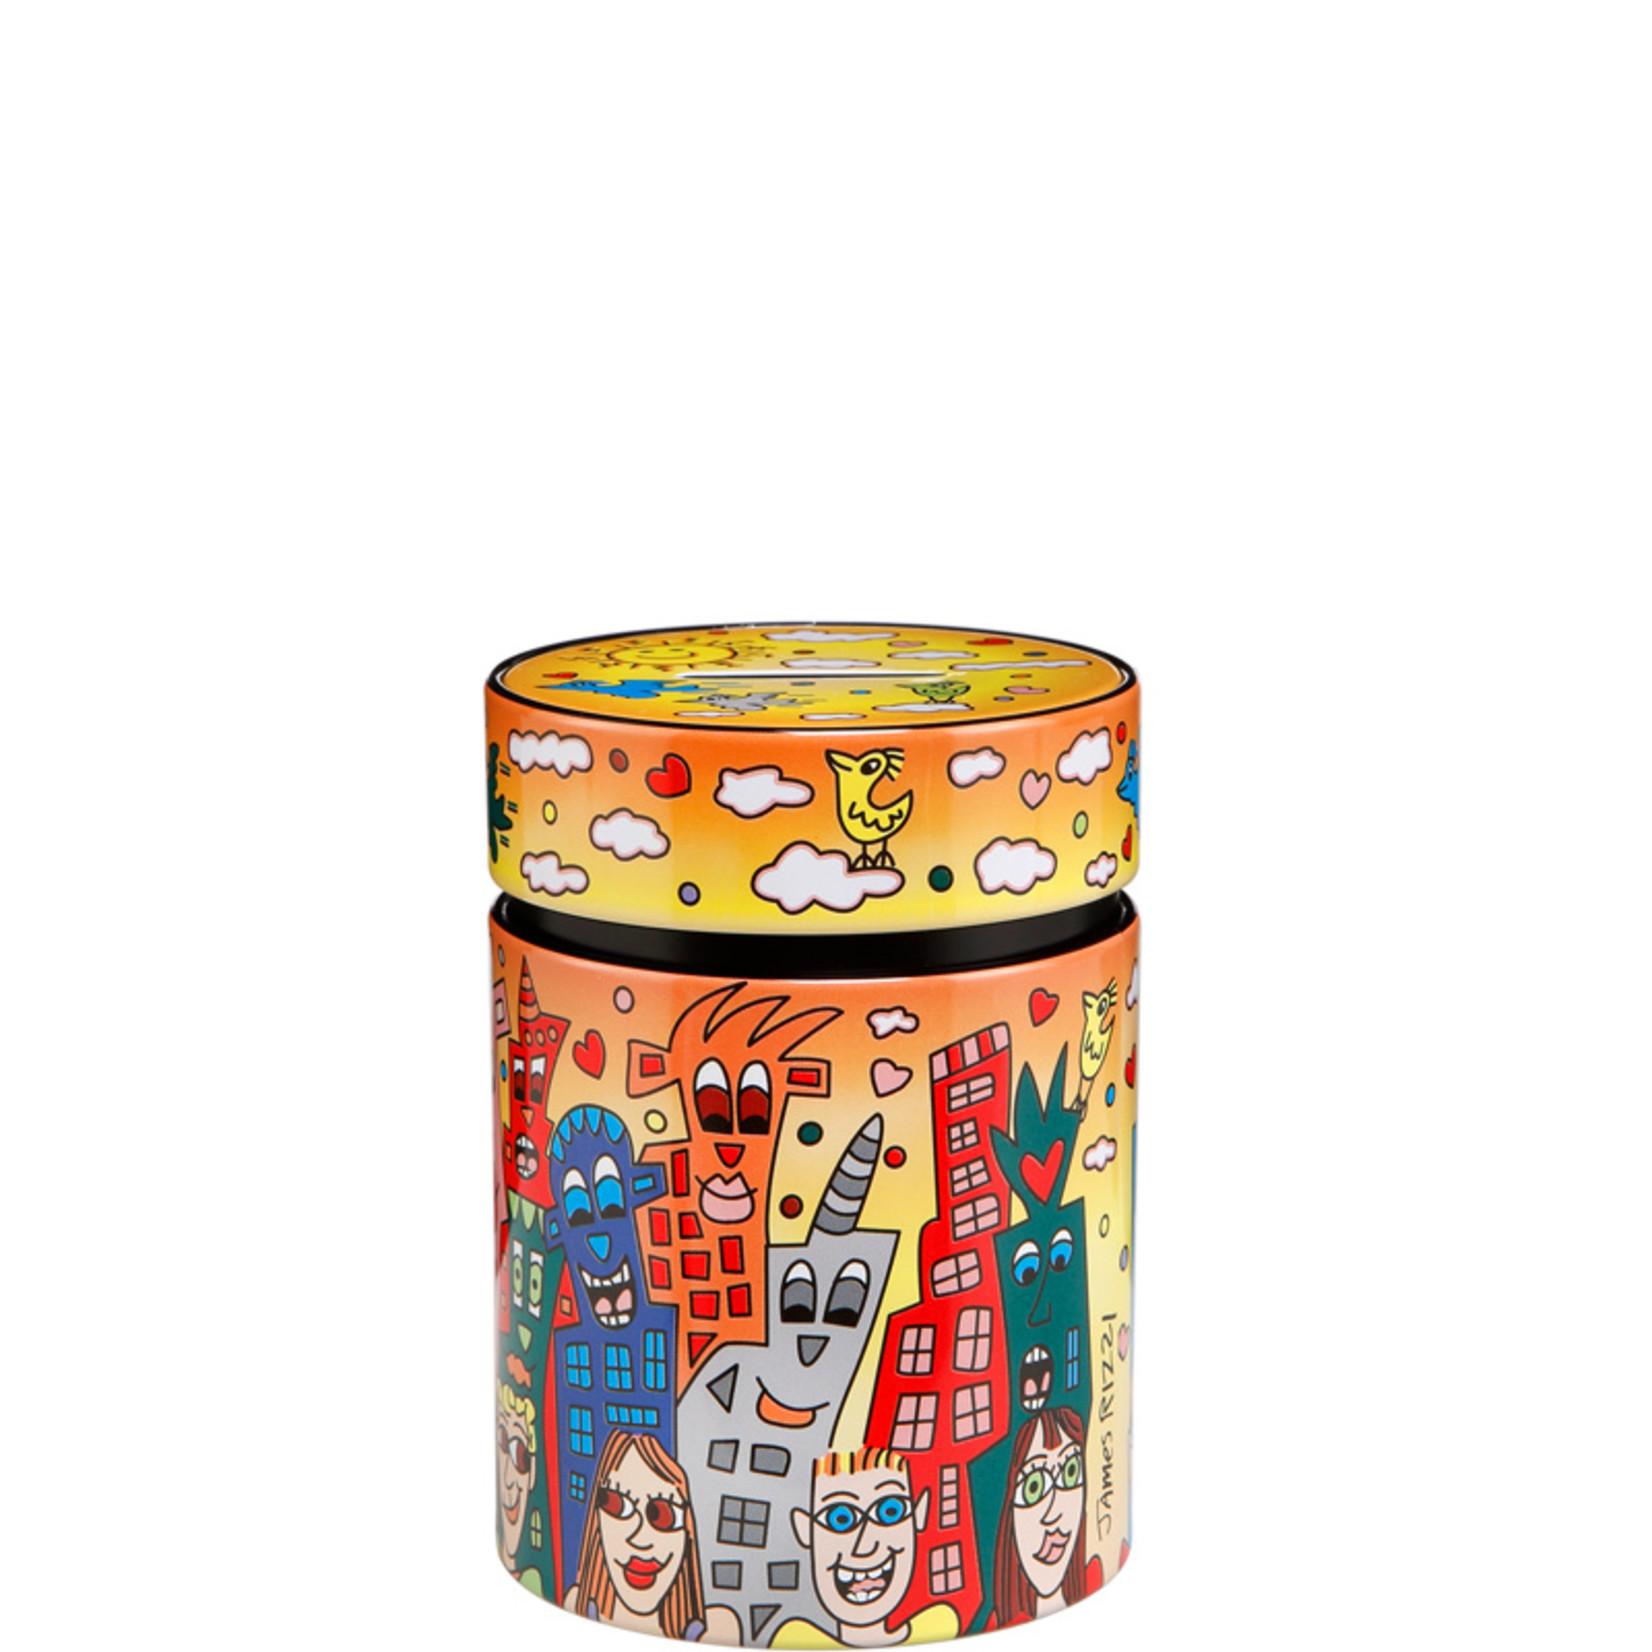 Goebel Porzellanmanufaktur Spardose City of Romance | James Rizzi | Goebel Porzellan | Metall